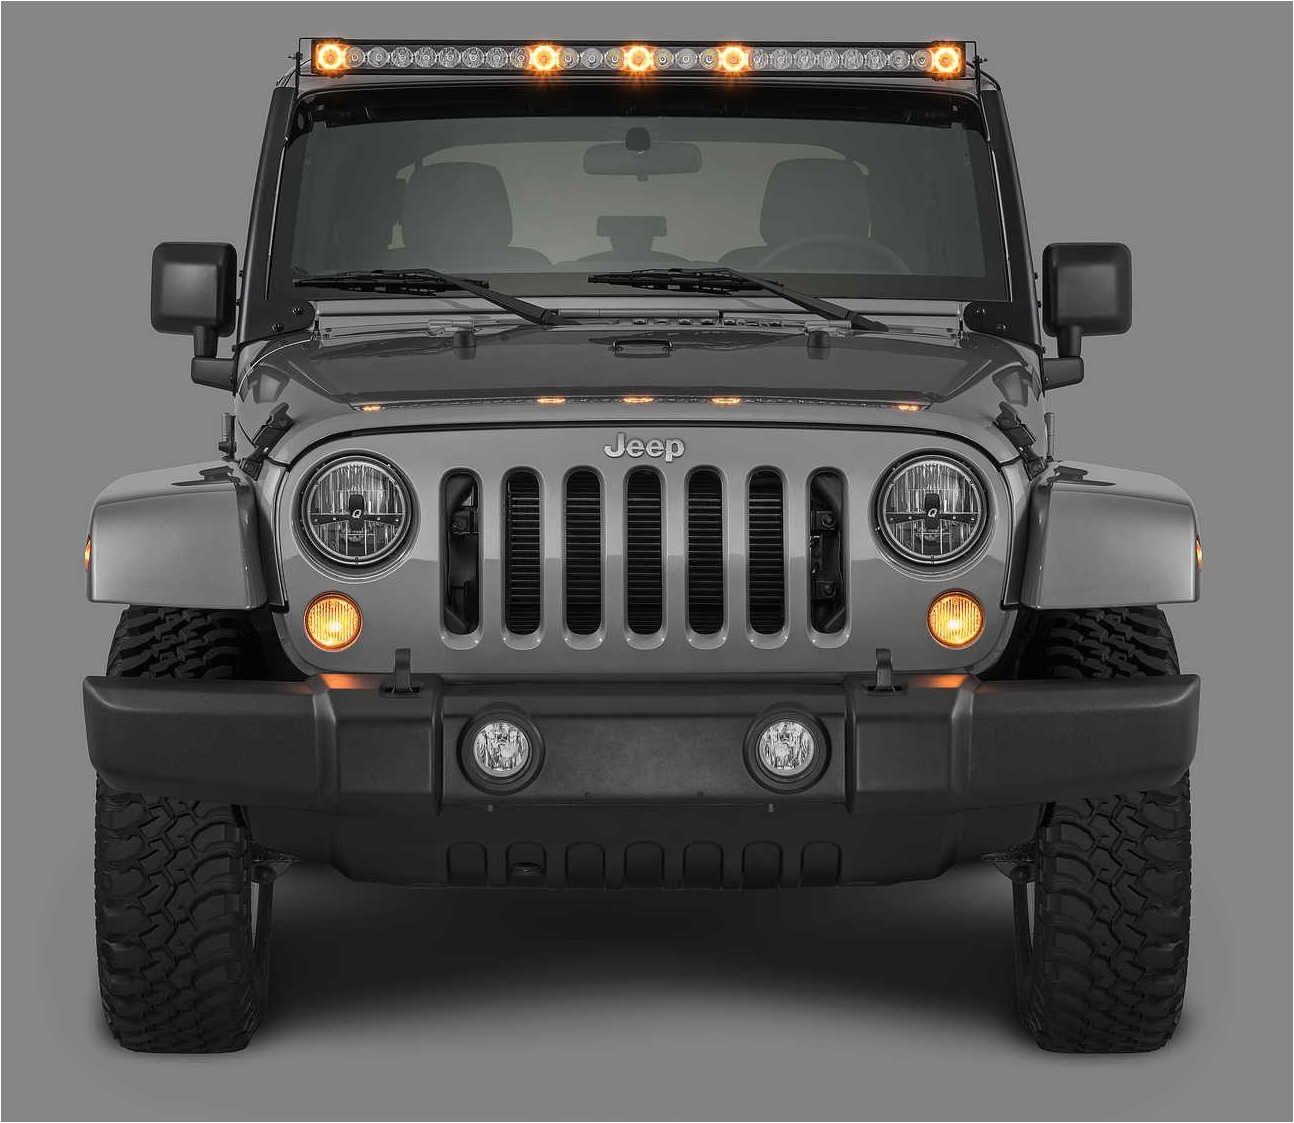 quadrateca j5 led light bar with amber clearance cab lights for 07 17 jeep wrangler jk quadratec